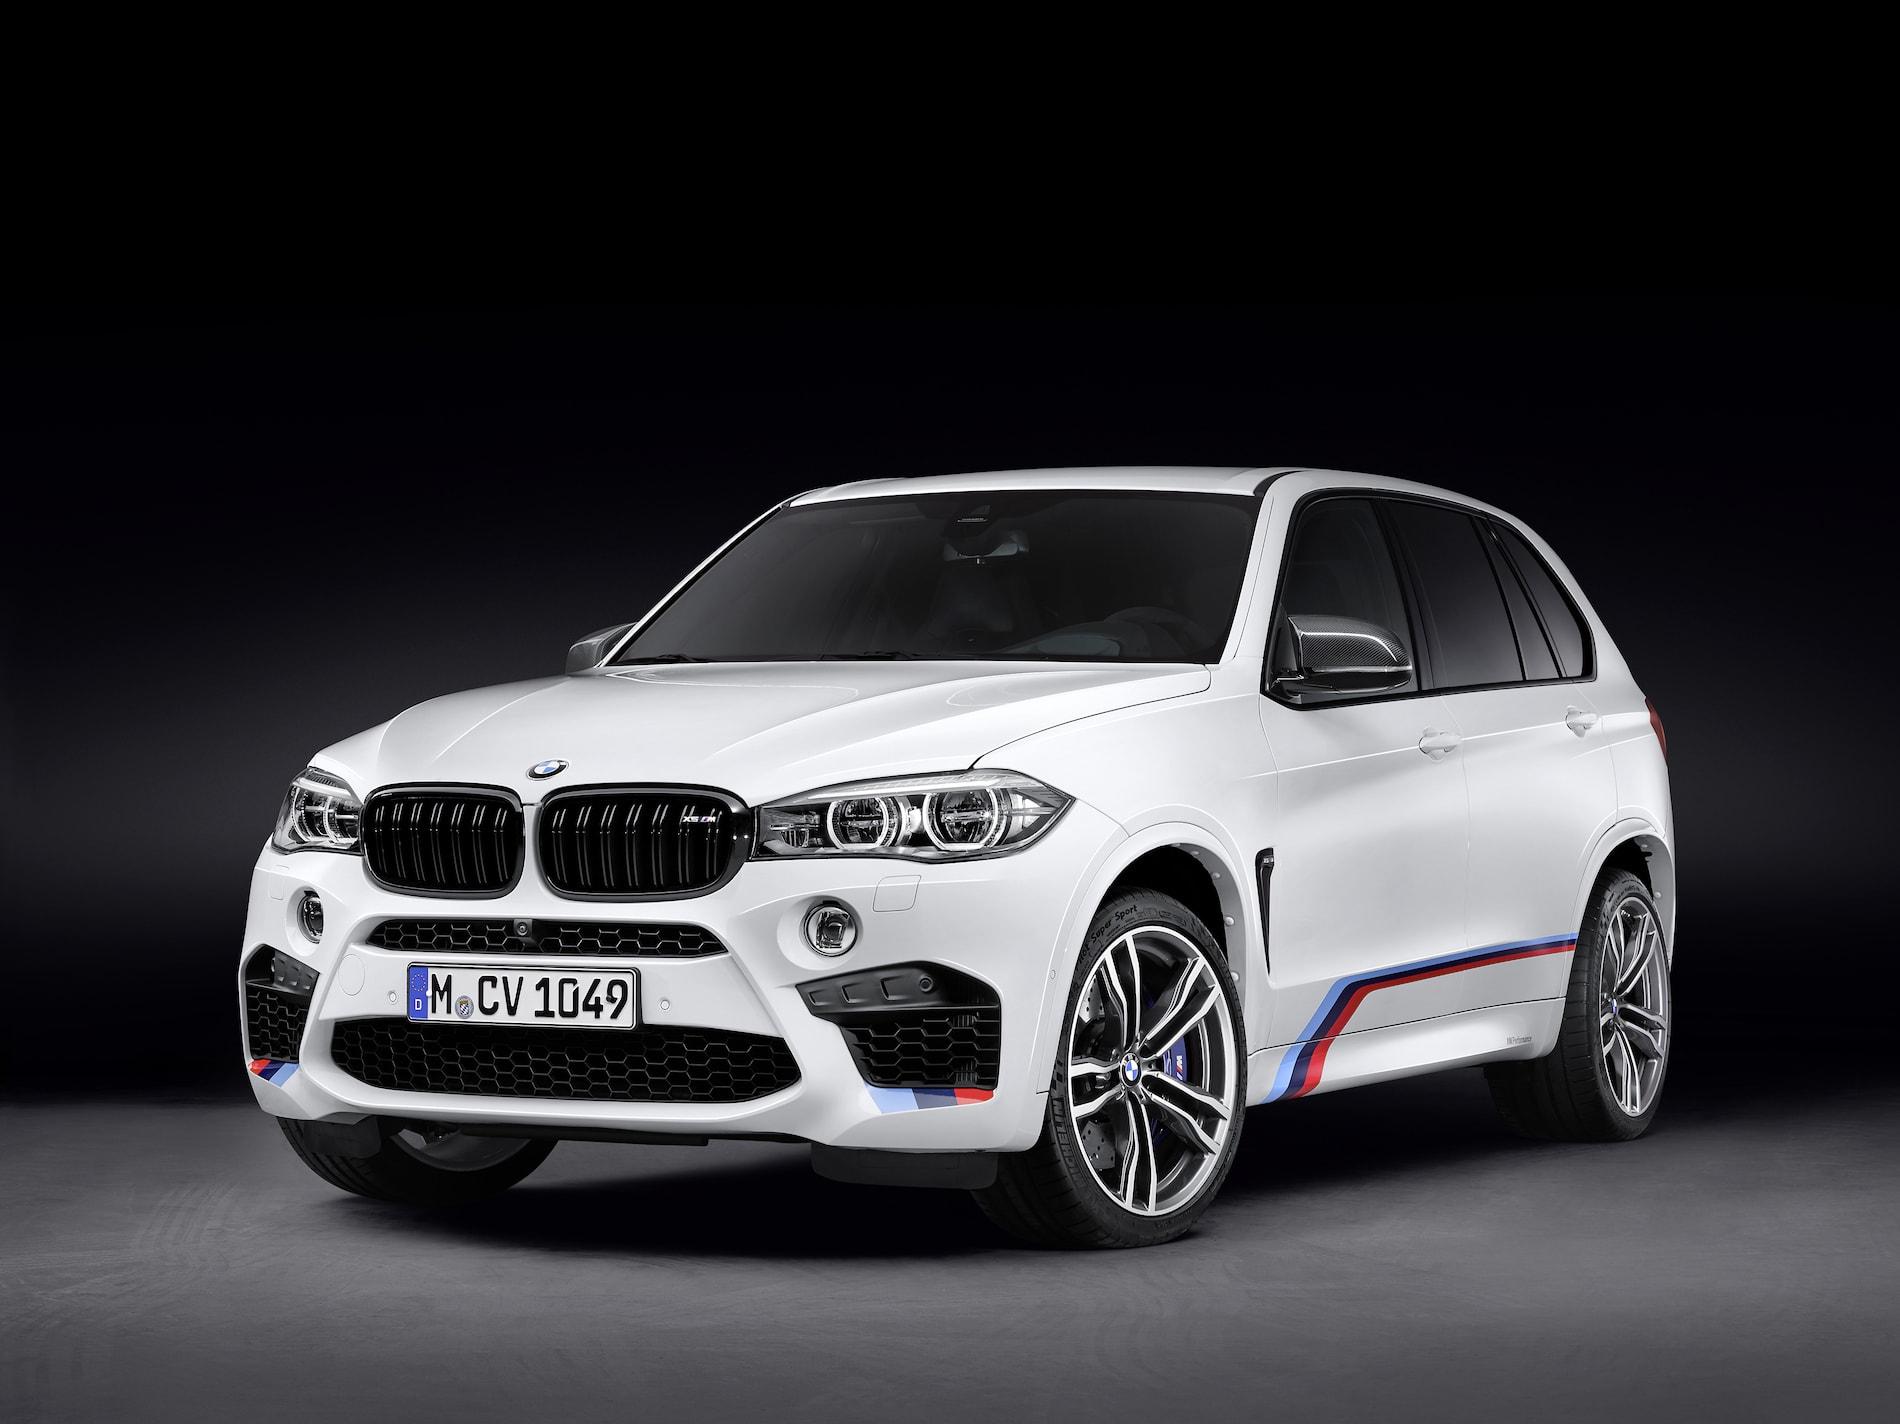 BMW X5M (F85) Widescreen for desktop